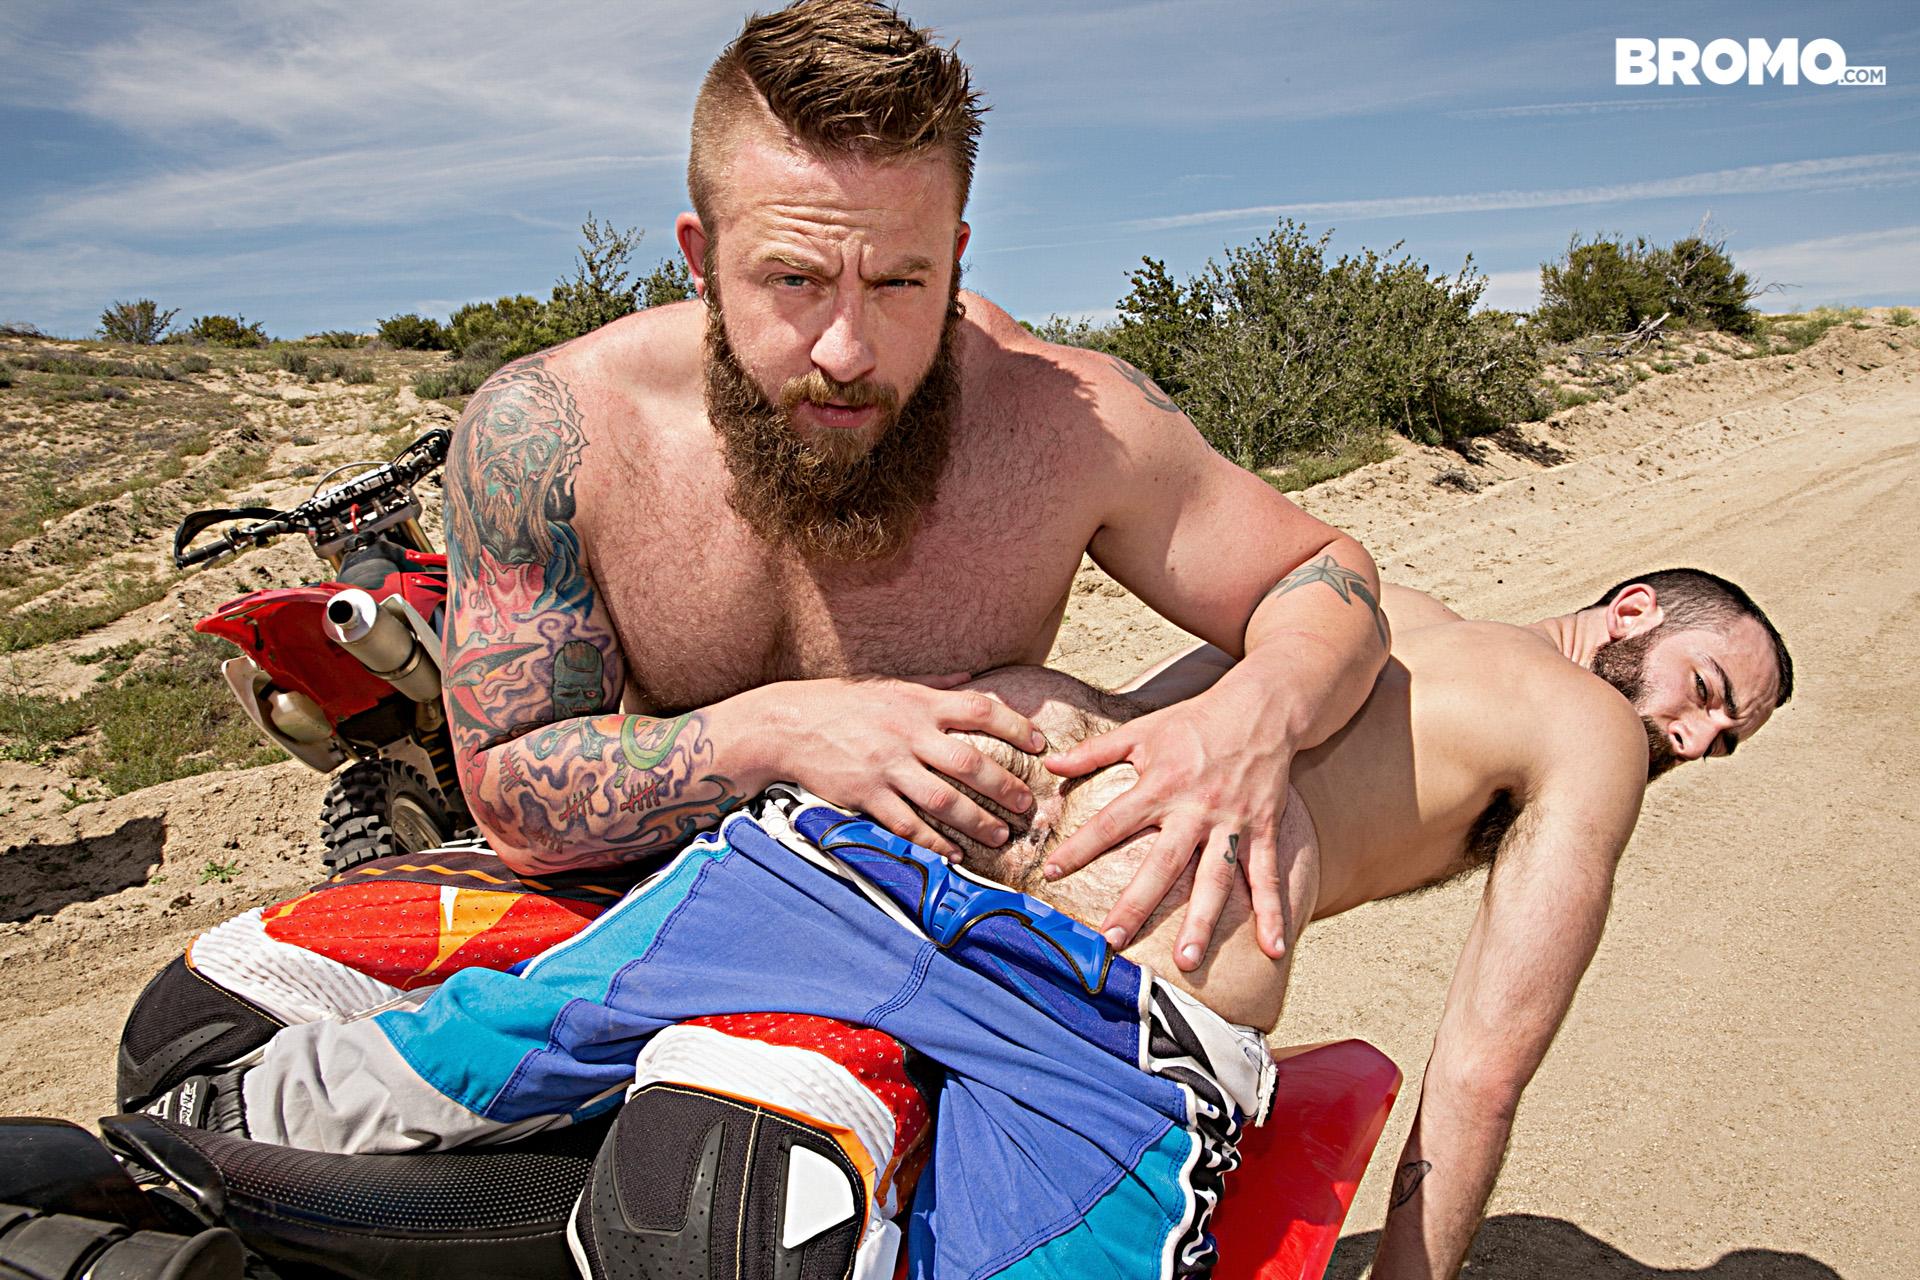 Gay bareback biker xxx pics of guys cumming 4